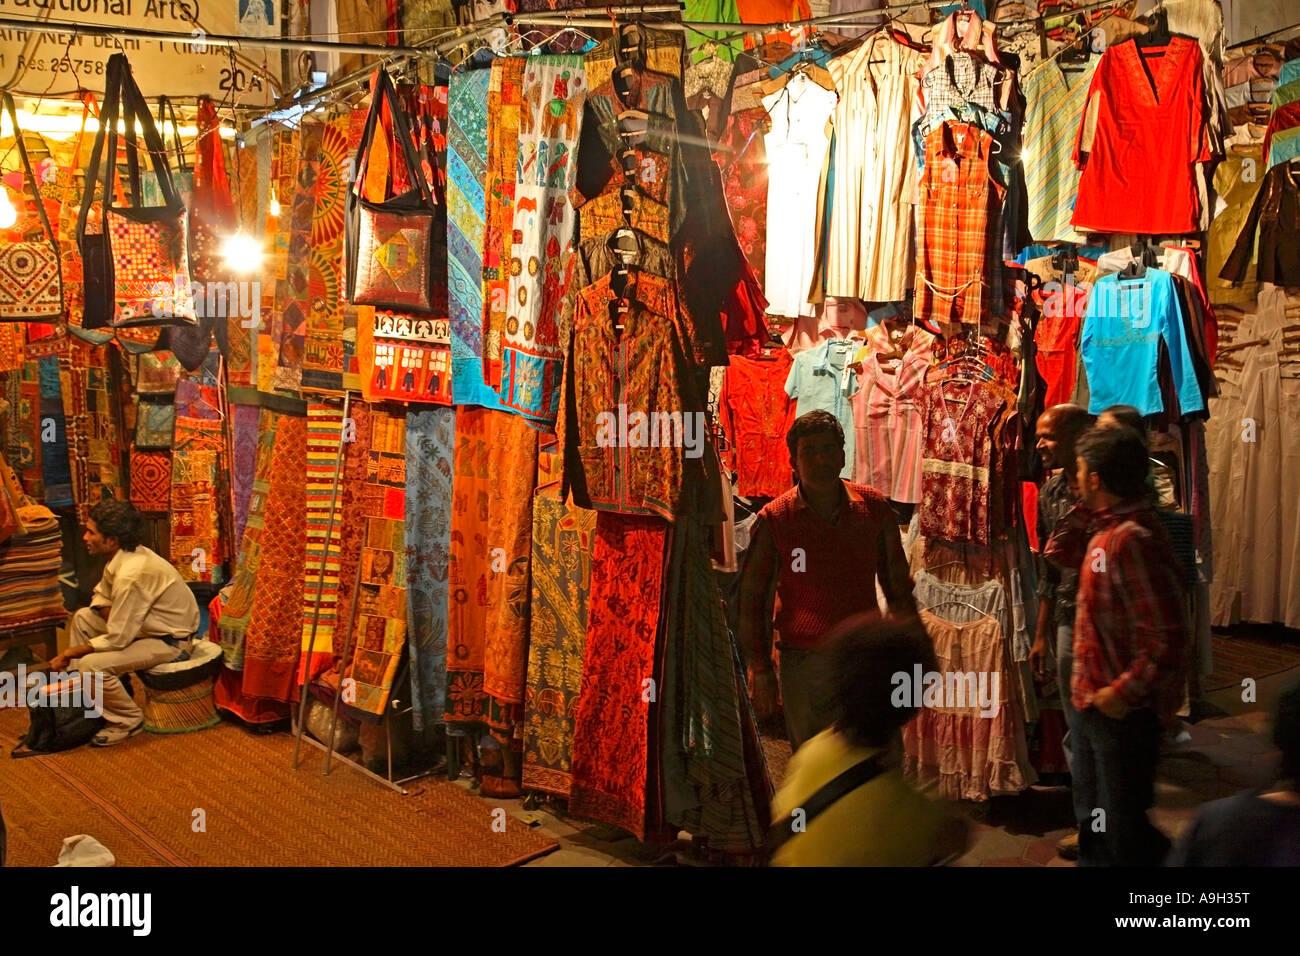 India Delhi Janpath By Night Mood Shops Market Night Shoppers Indian